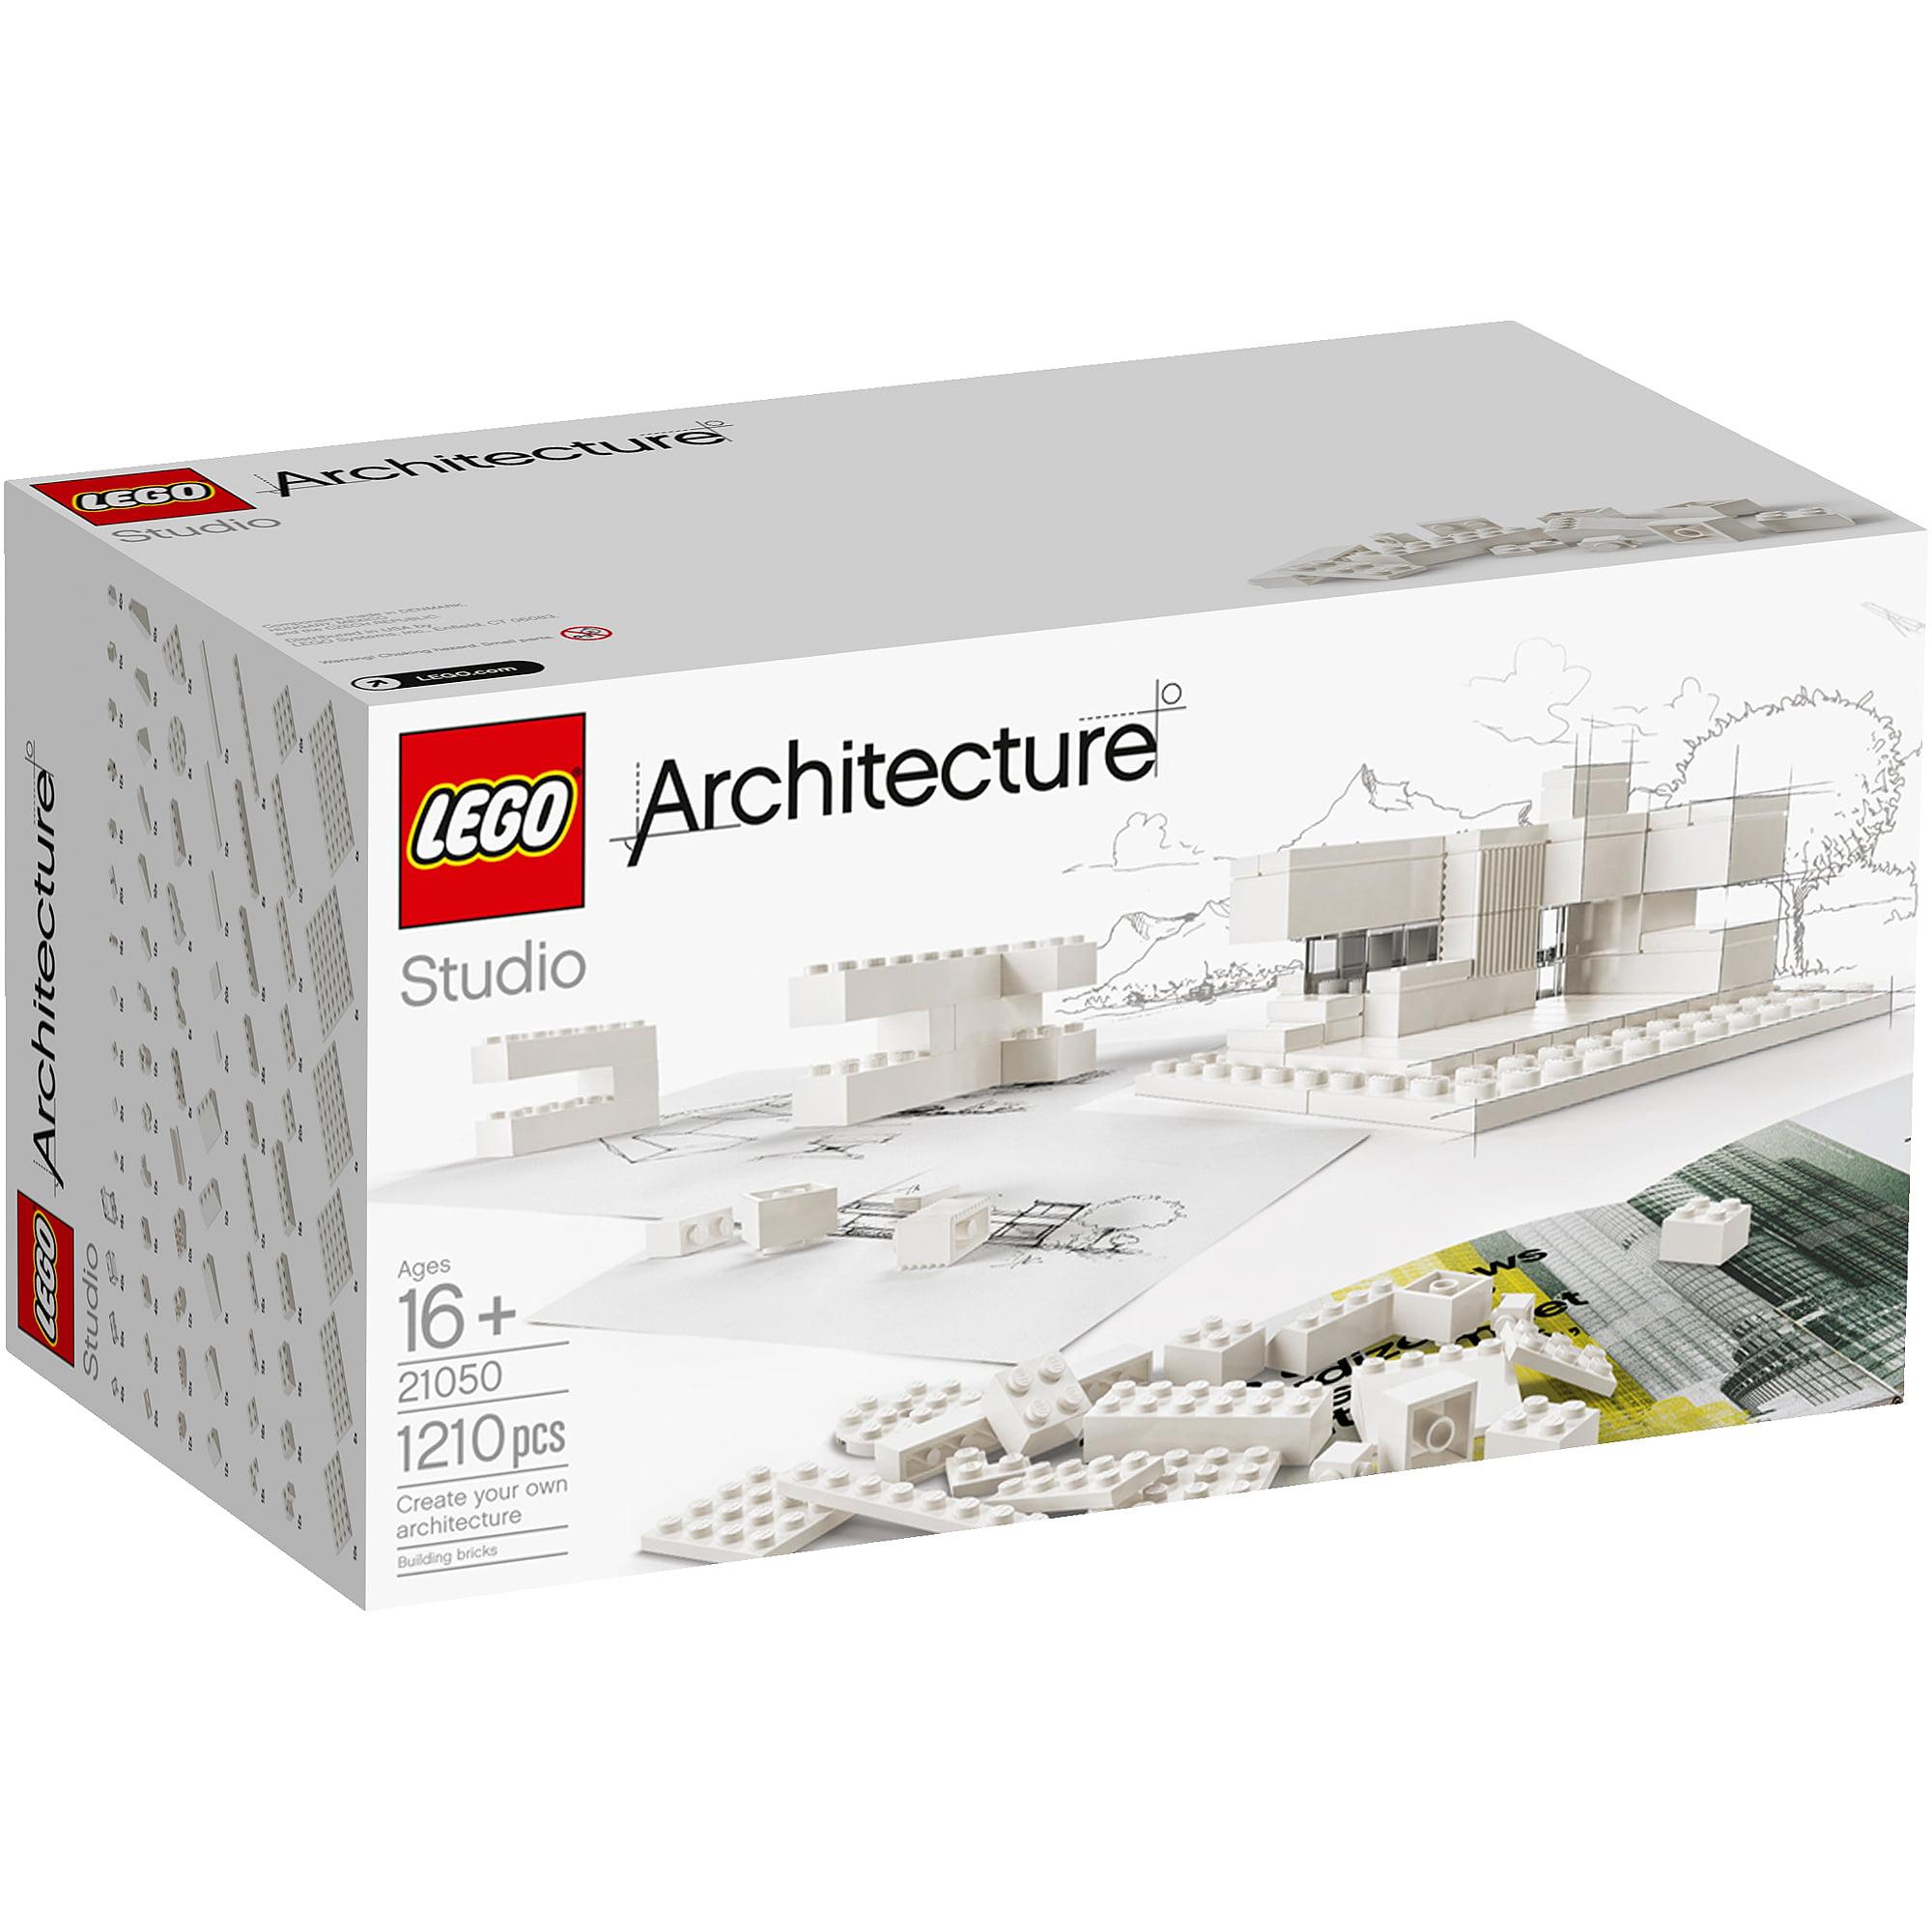 Lego Architecture Studio by